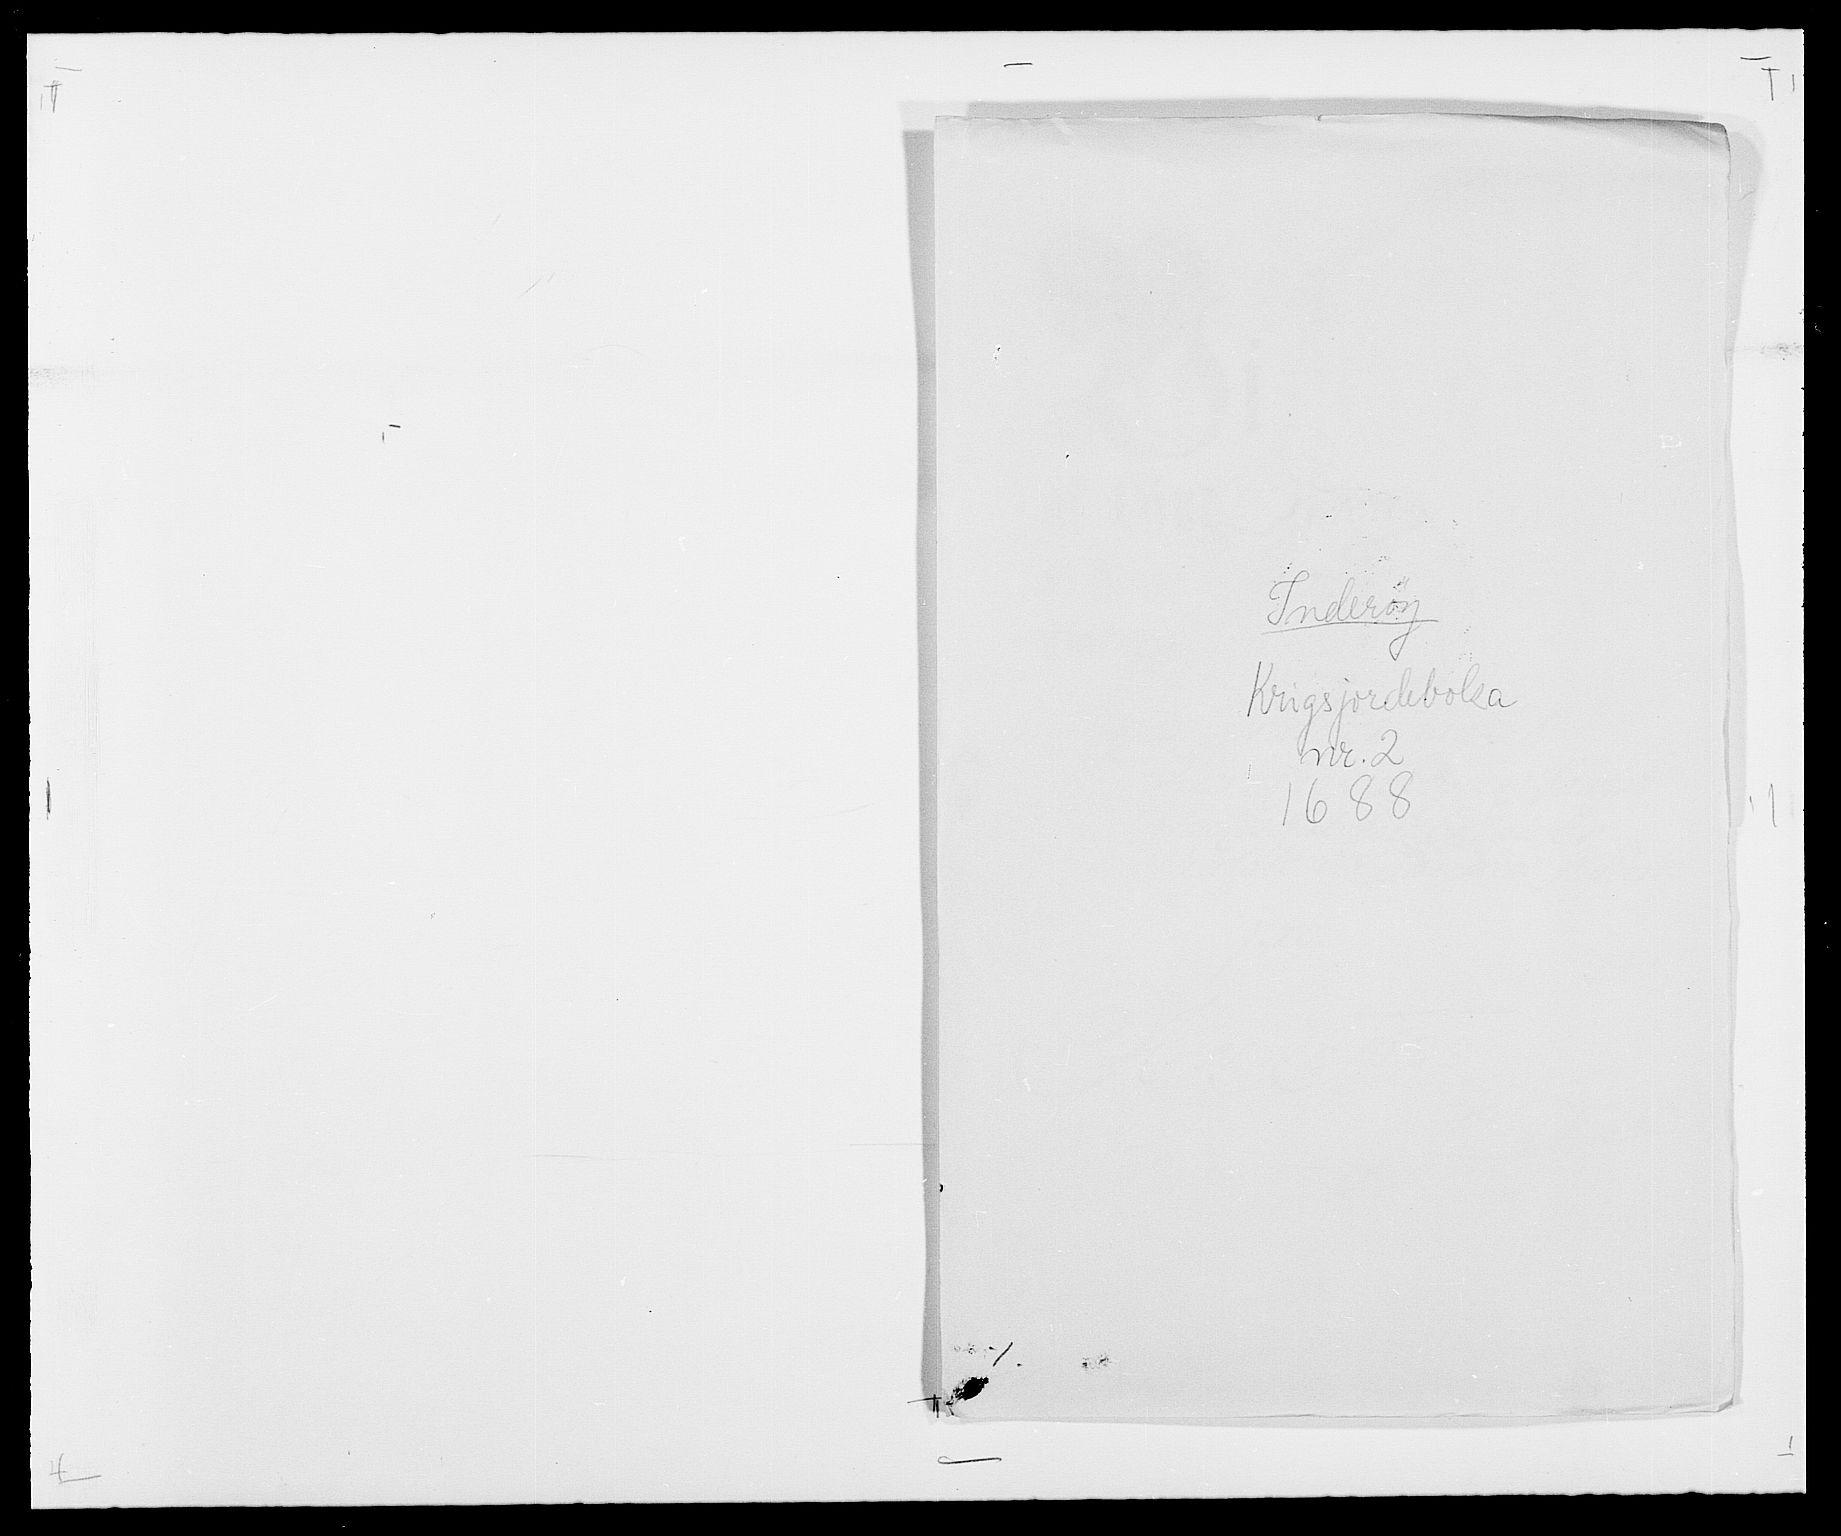 RA, Rentekammeret inntil 1814, Reviderte regnskaper, Fogderegnskap, R63/L4306: Fogderegnskap Inderøy, 1687-1689, s. 363